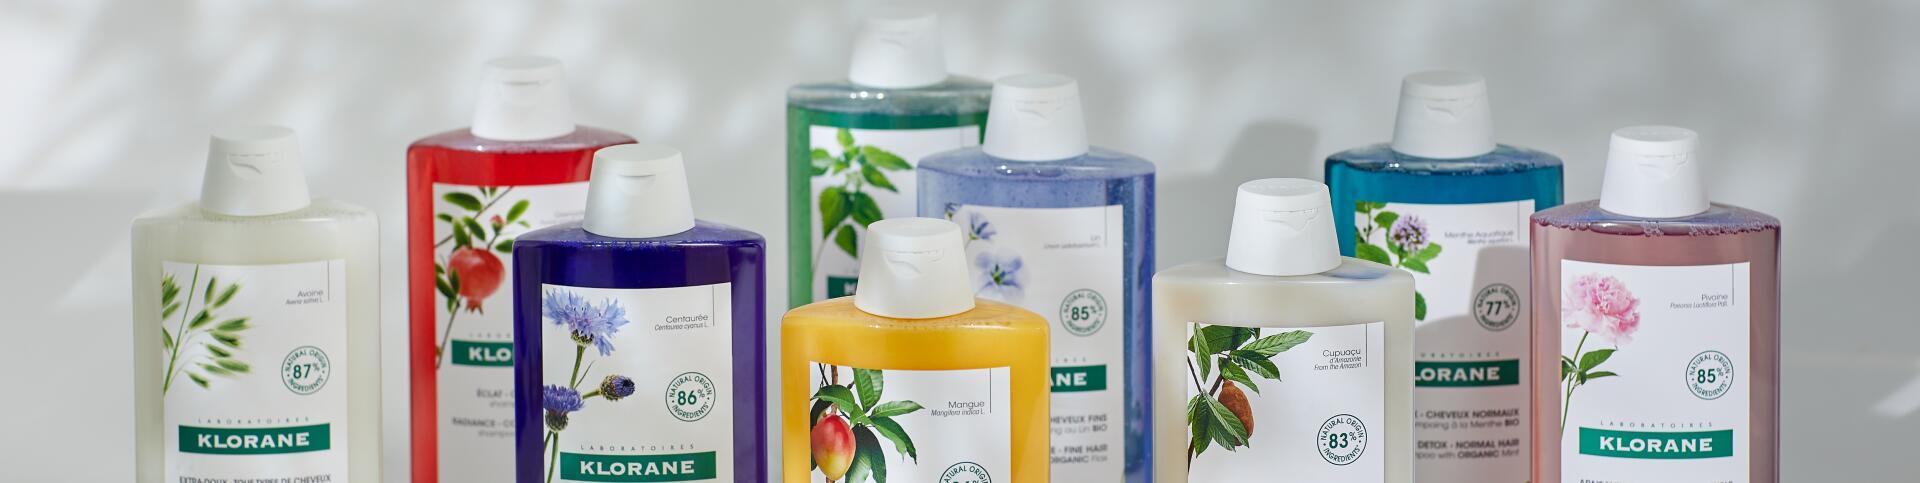 kl_hair_shampoo_naturalization_400 ml_range_picture_2021